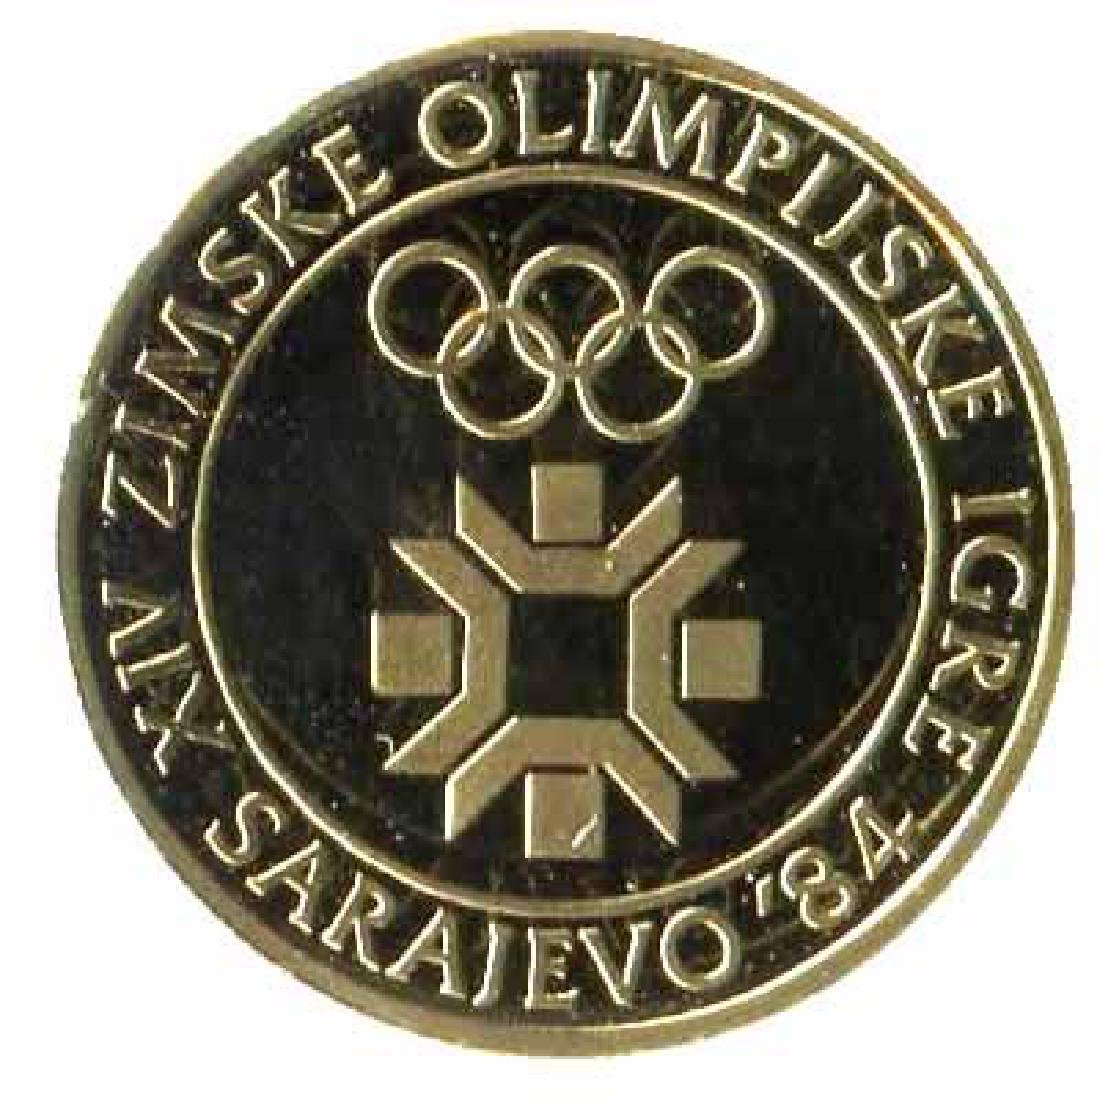 Yugoslavia 5000 dinara gold pf 1982 Olympics